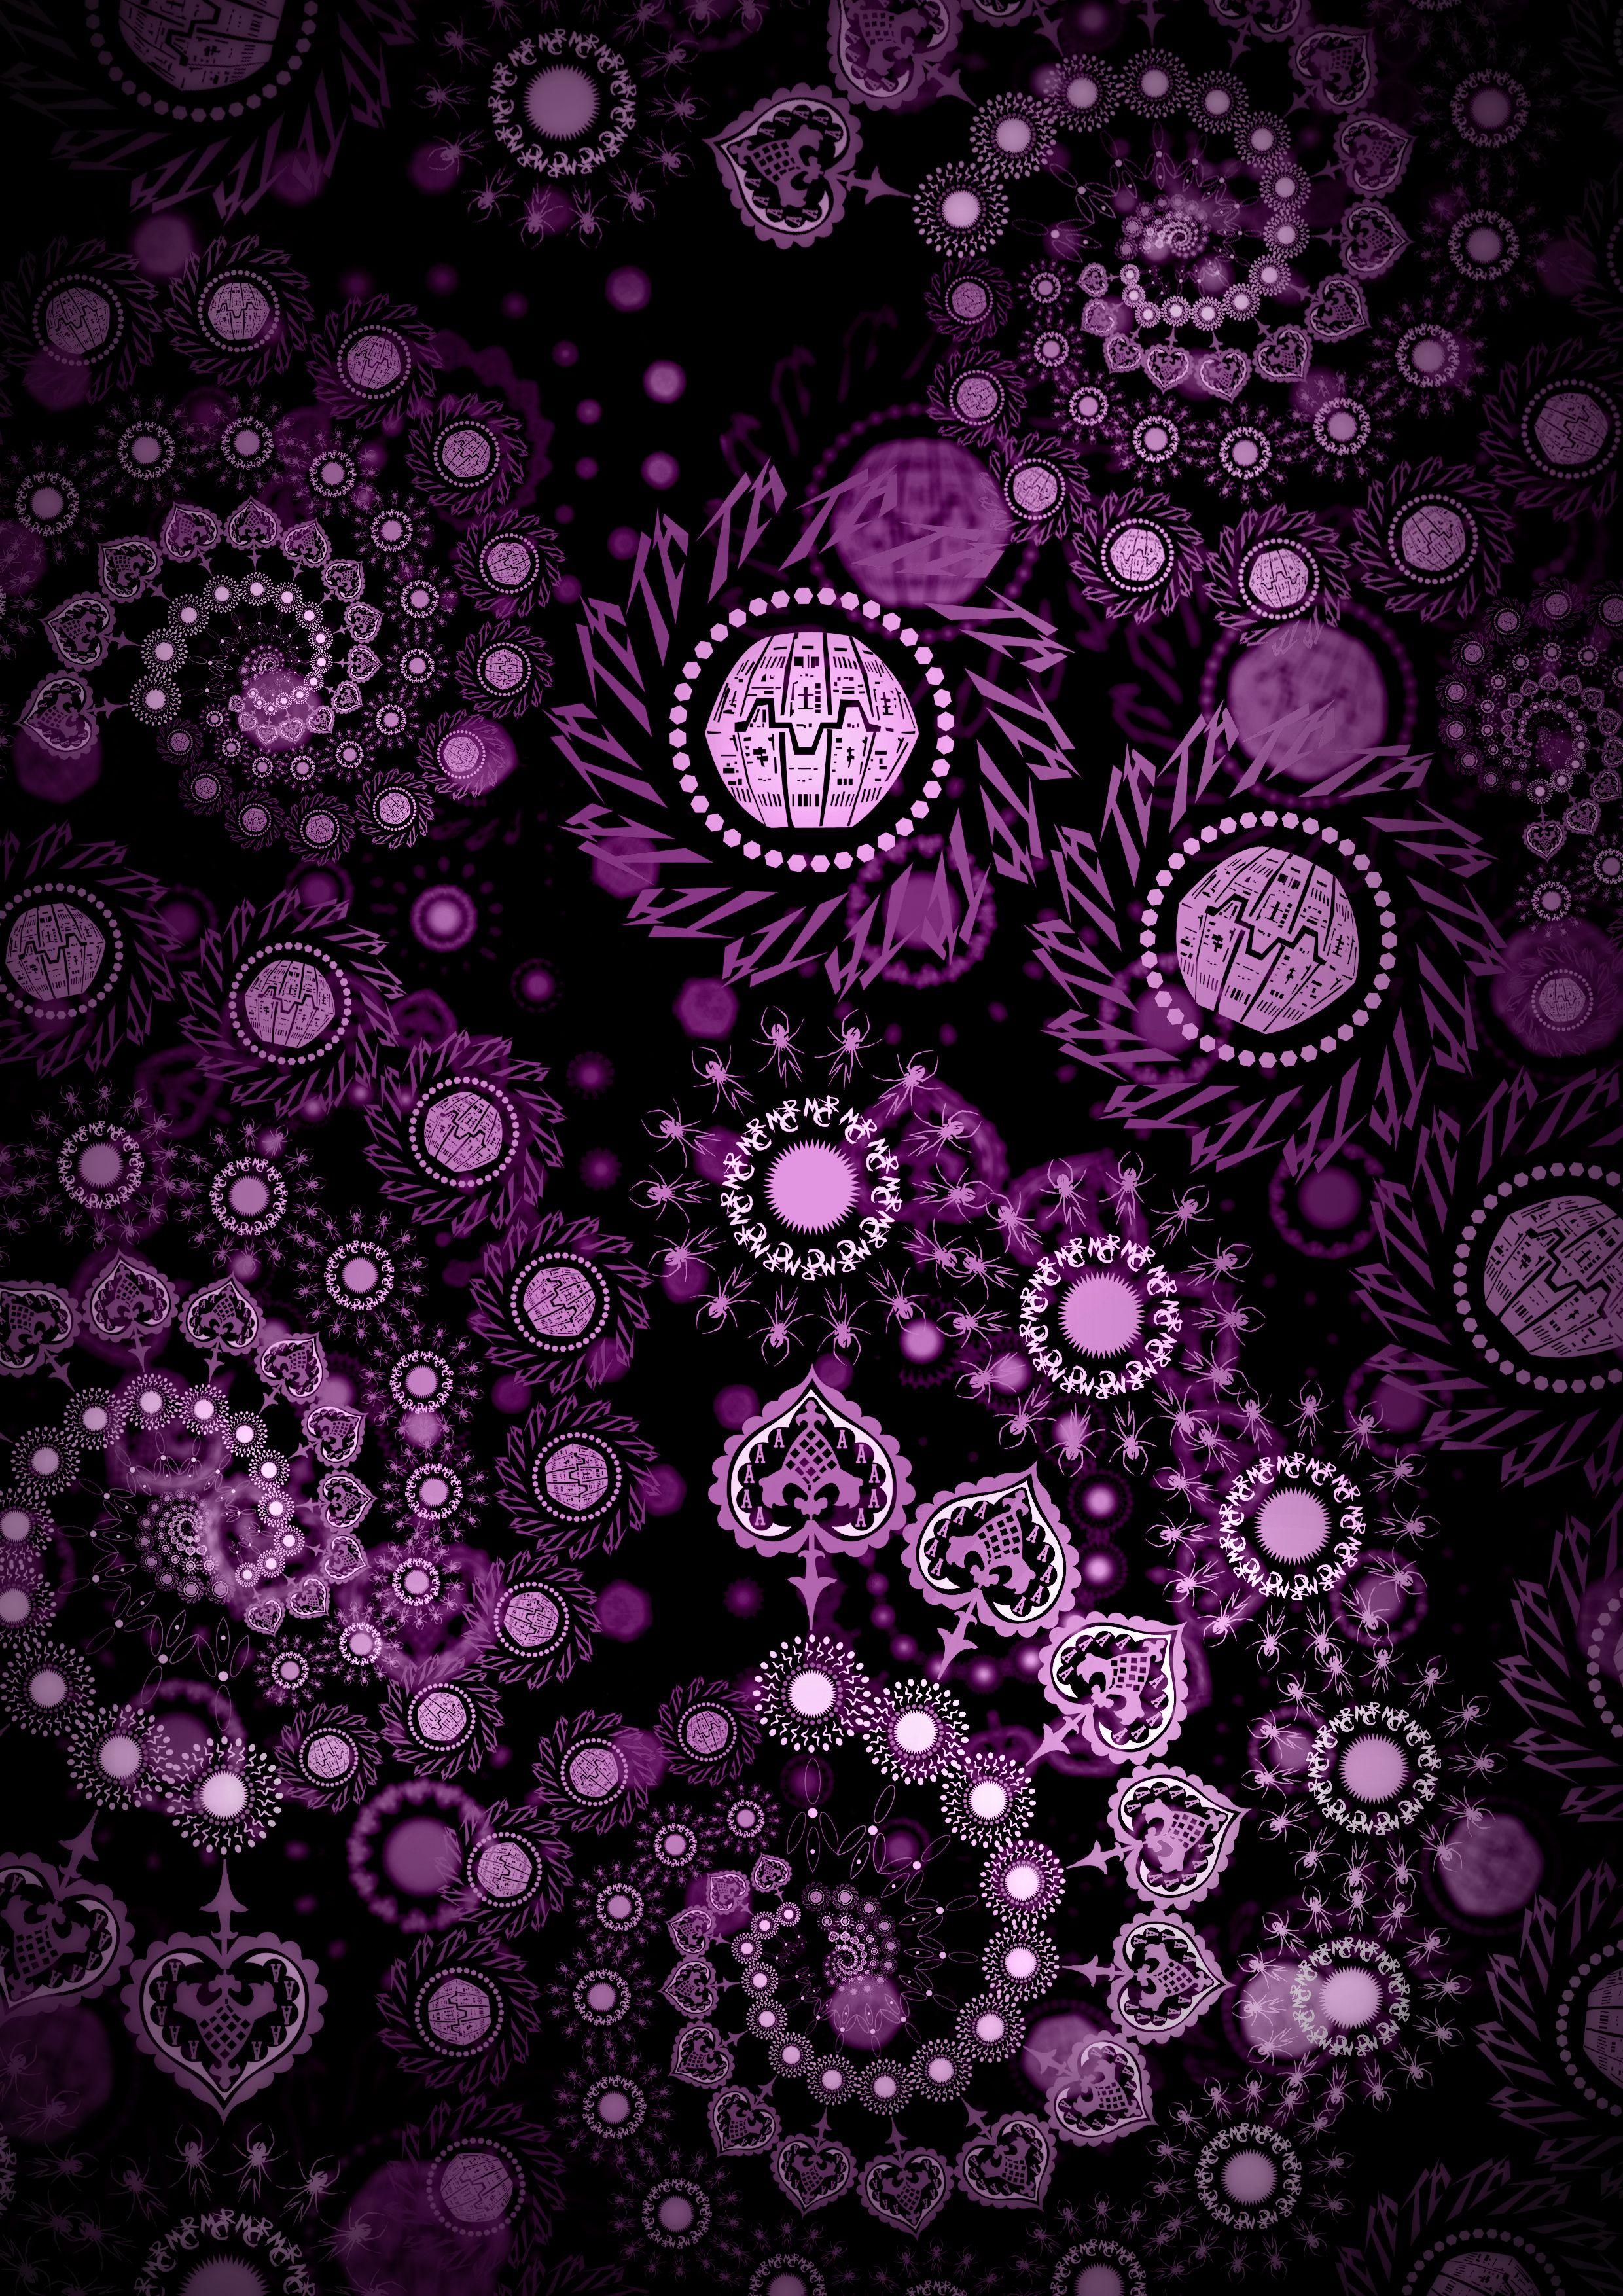 Fractal mychemicalromance dangerdays tokiohotel humanoid fractal mychemicalromance dangerdays tokiohotel humanoid silencekanndestroy tutorial inspiration illustration baditri Gallery